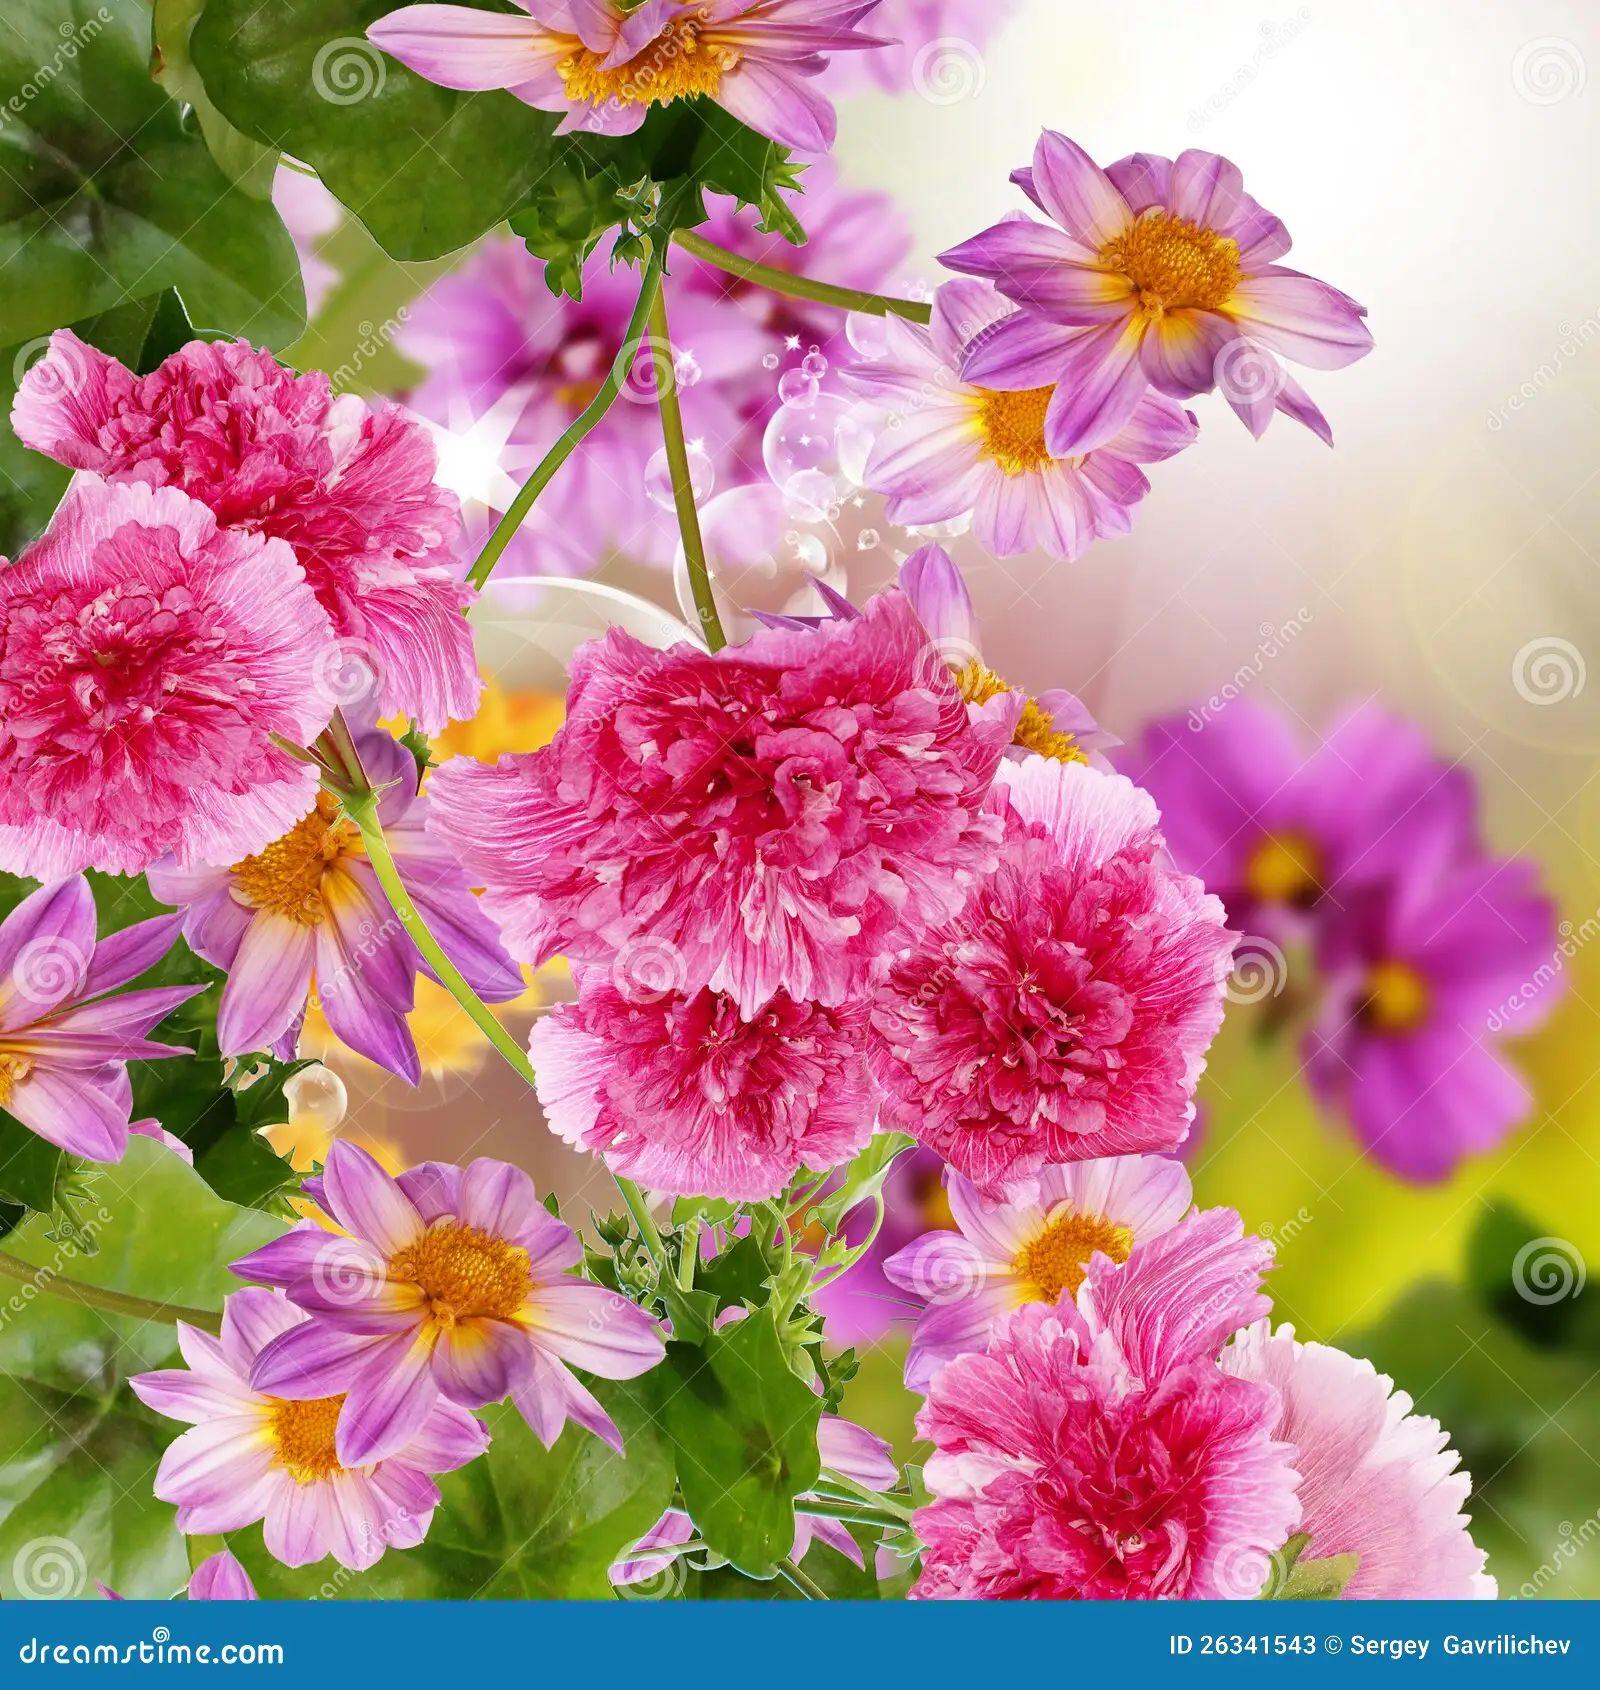 Flowers garden stock photos image 26341543